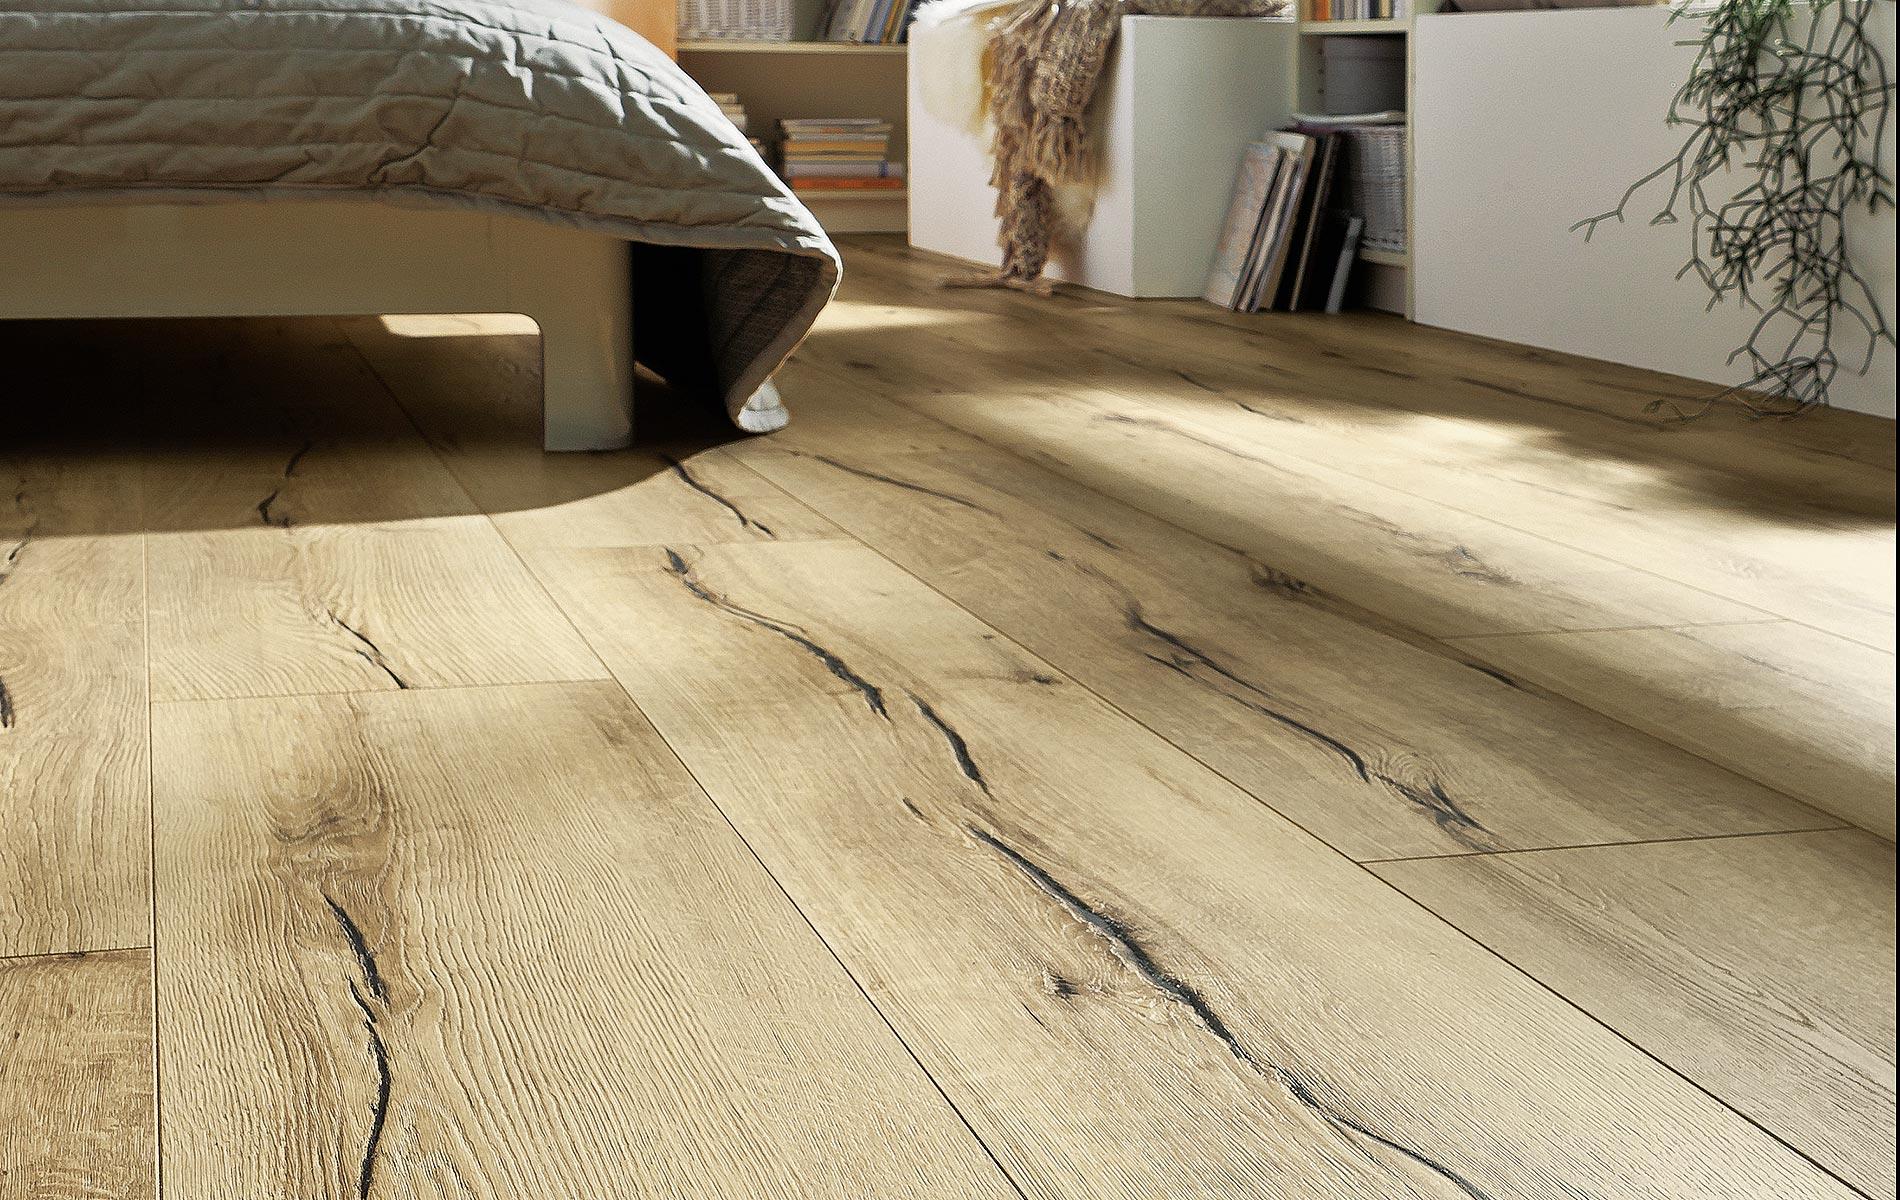 kork b schking raumkonzept. Black Bedroom Furniture Sets. Home Design Ideas